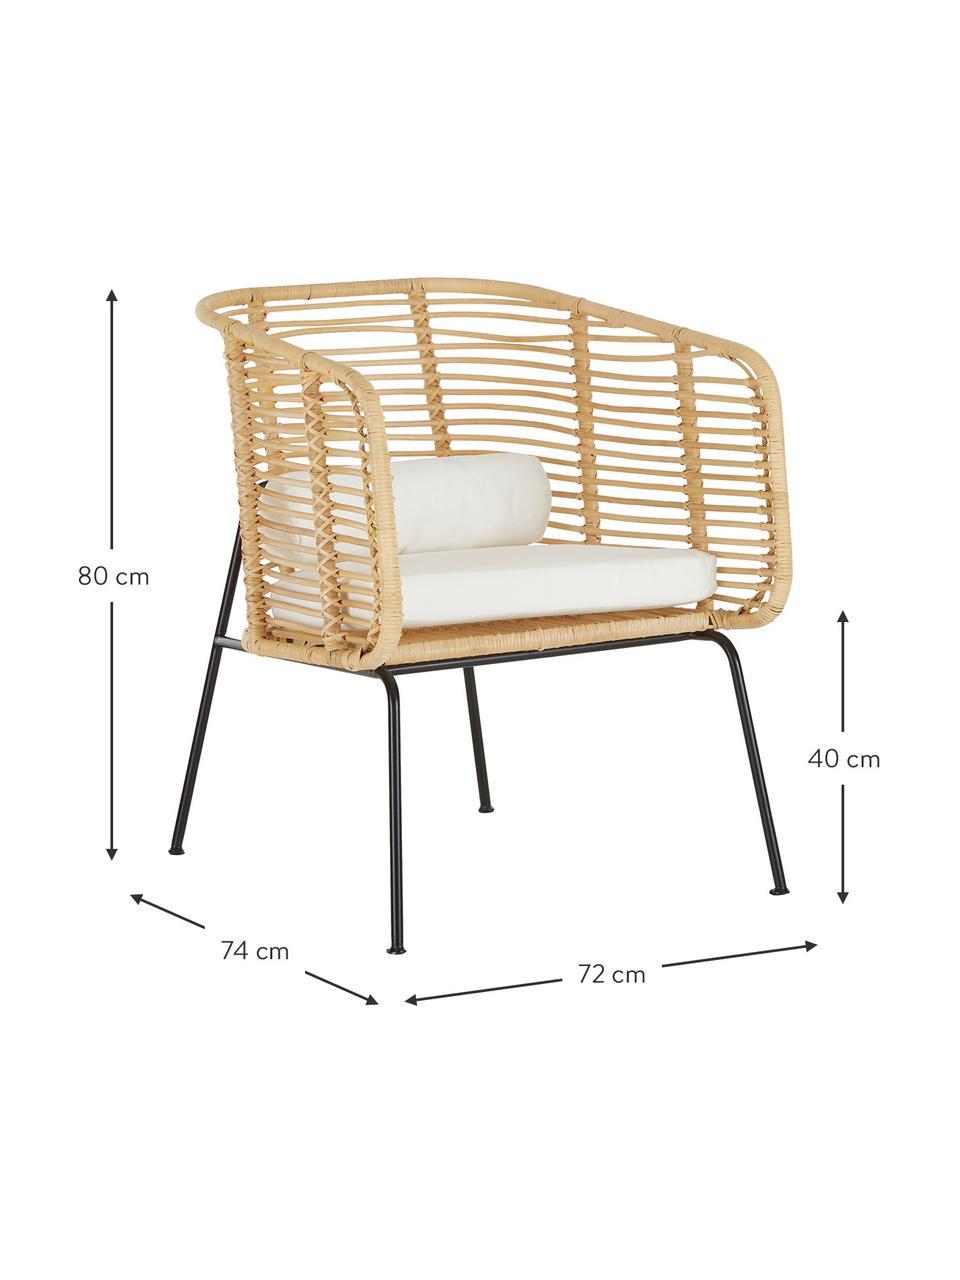 Rattan-Loungestuhl Merete, Sitzfläche: Rattan, Gestell: Metall, pulverbeschichtet, Rattan, Weiß, B 72 x T 74 cm